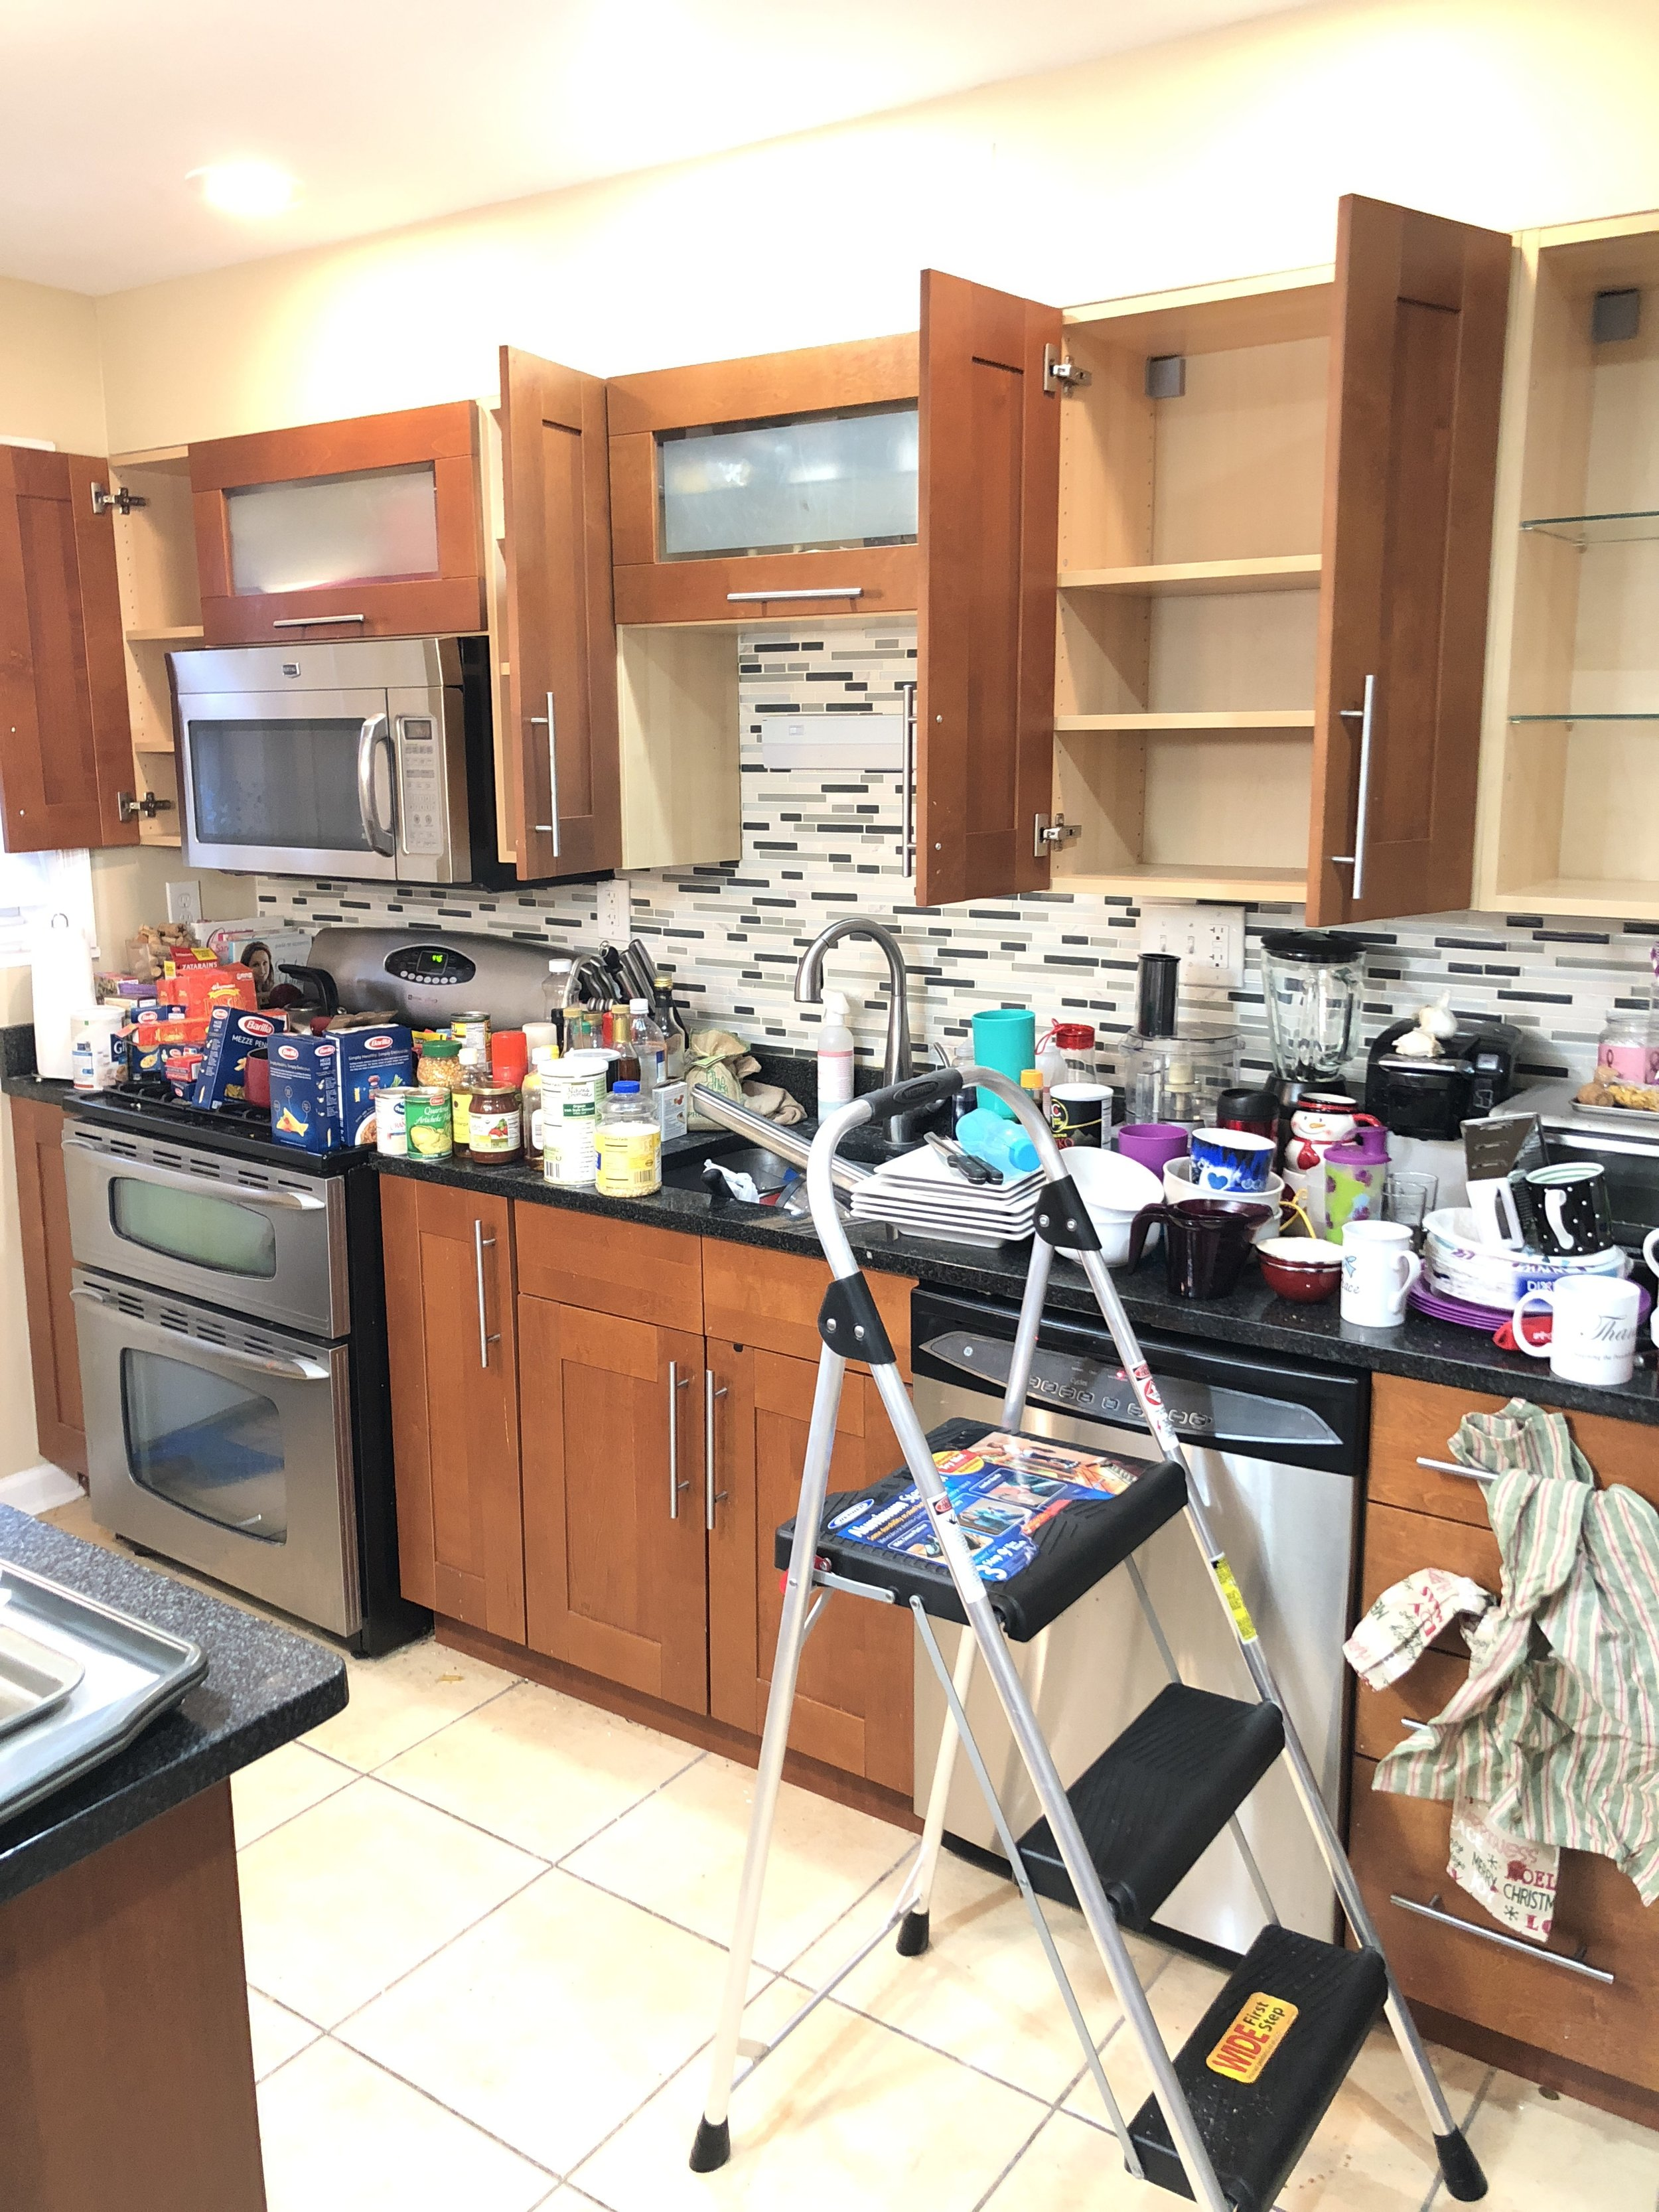 The kitchen purge.